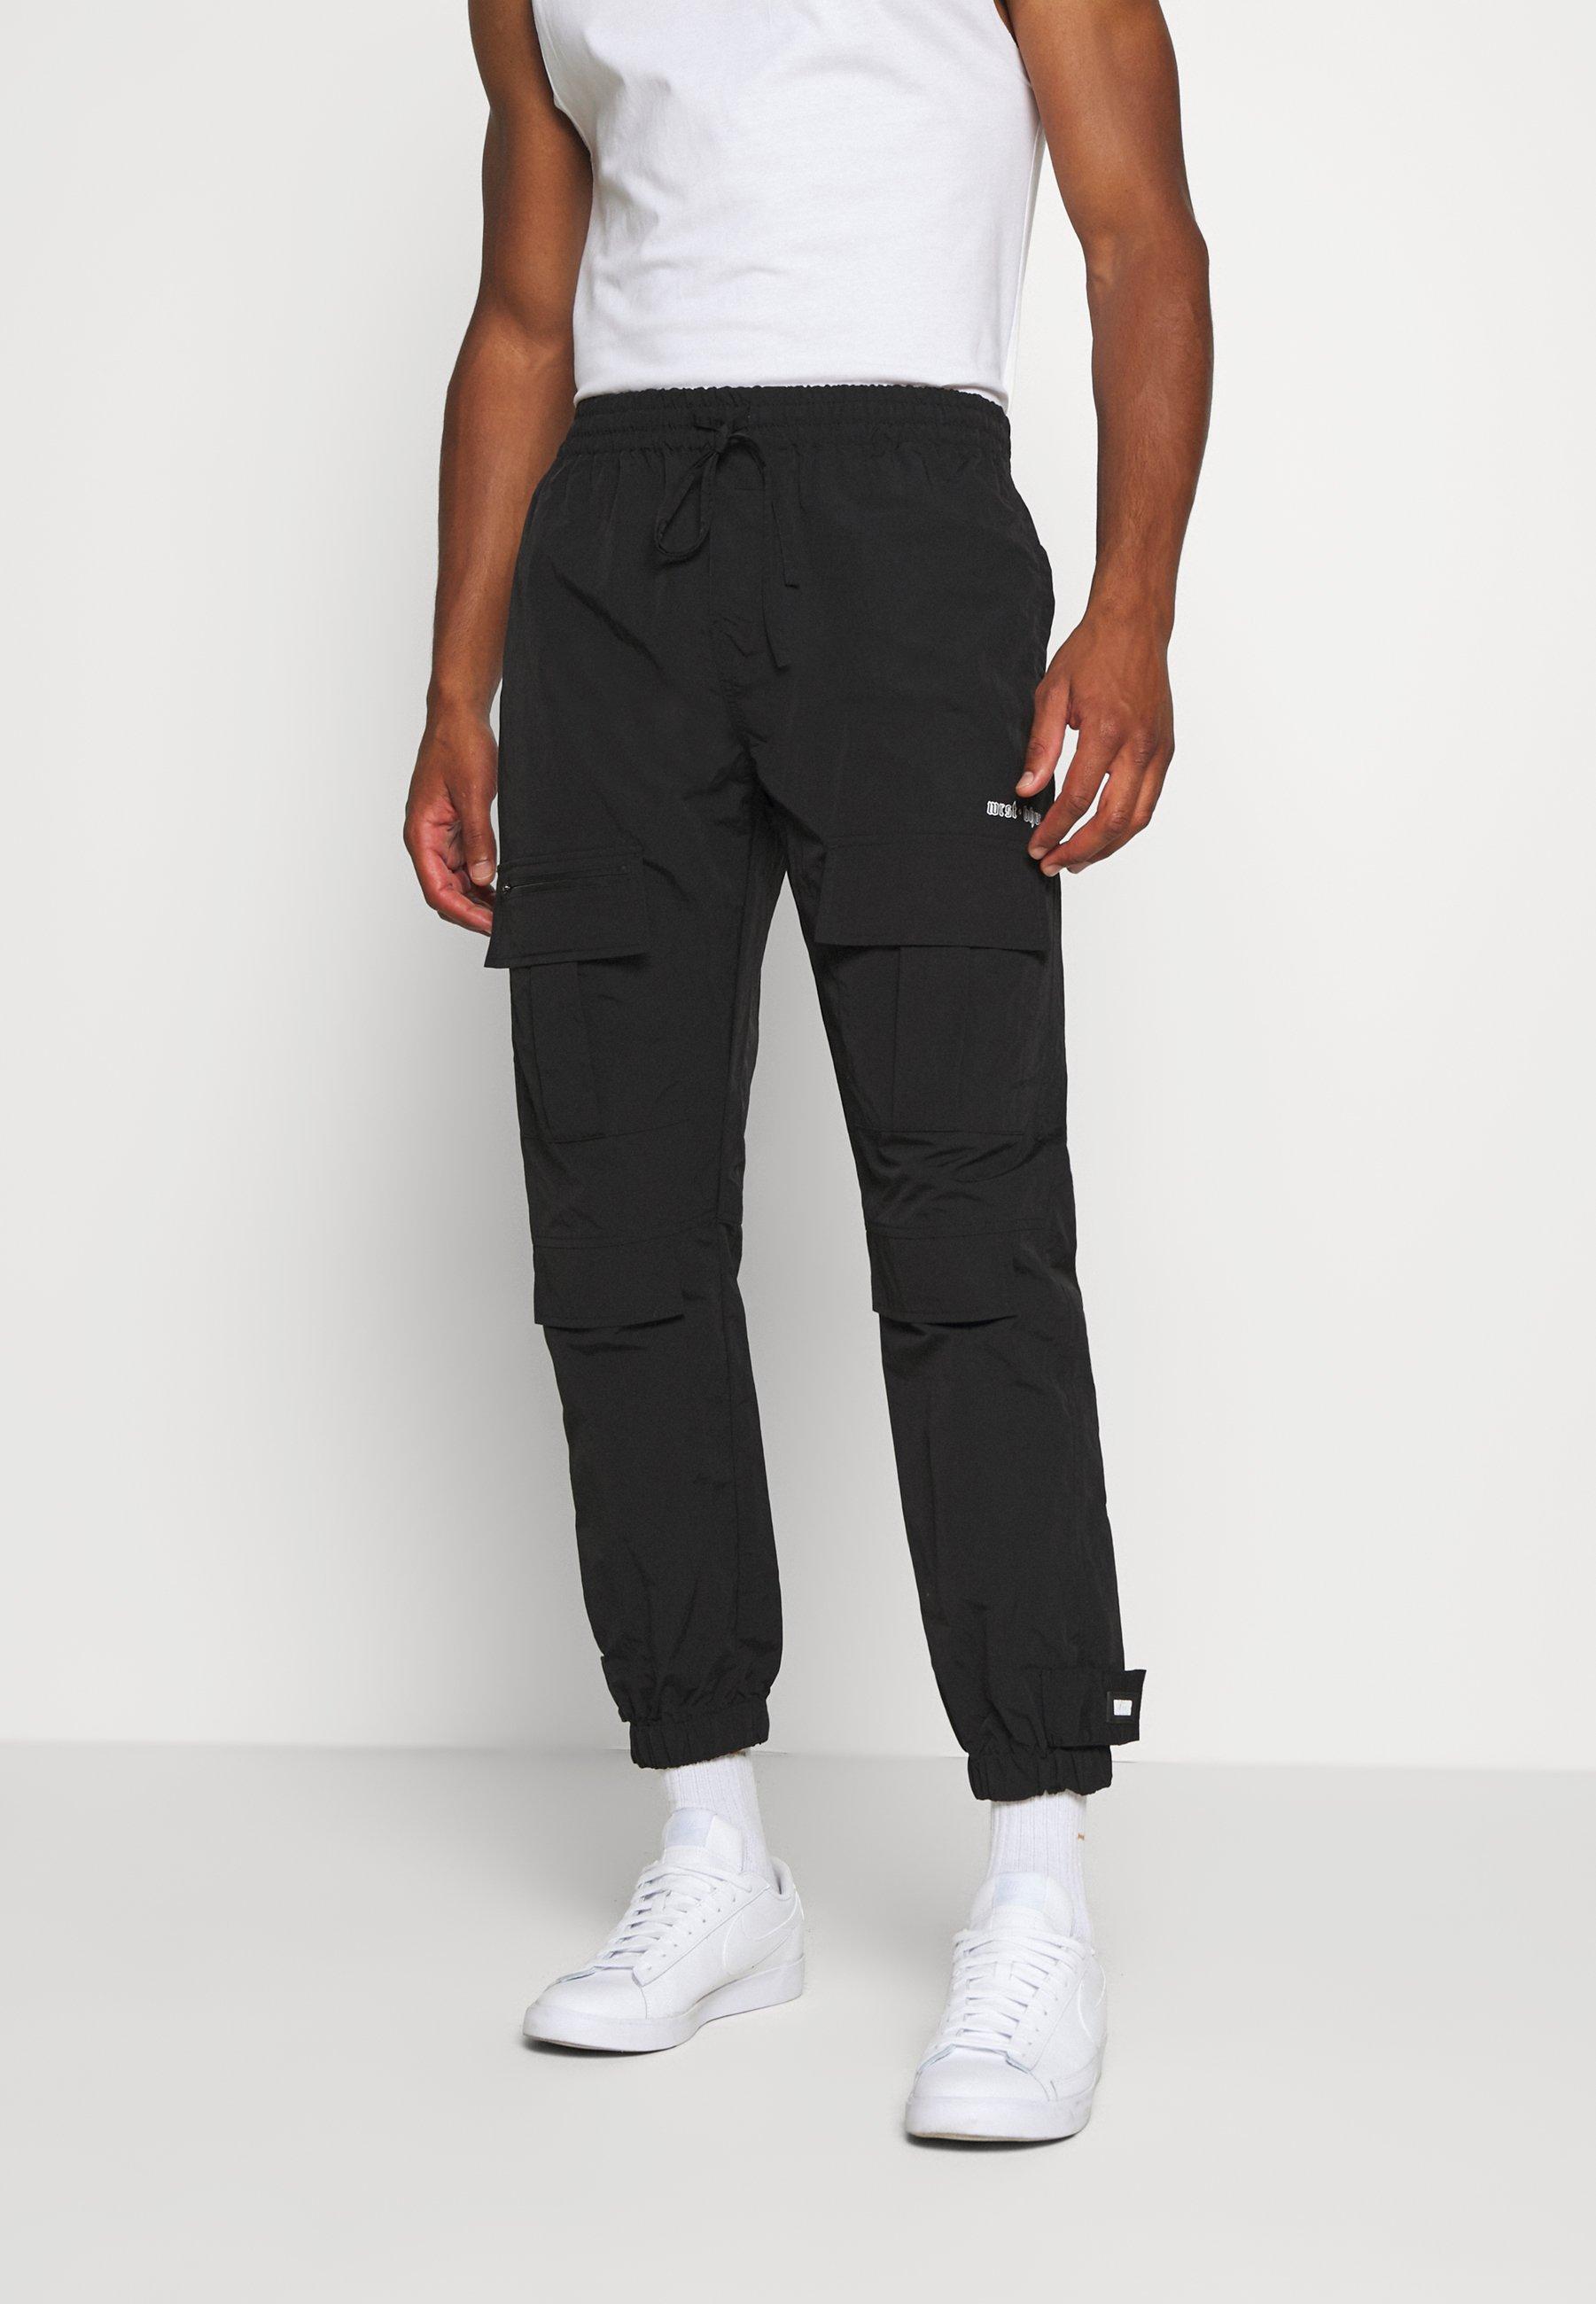 Homme TROUSER HYDRO UNISEX - Pantalon cargo